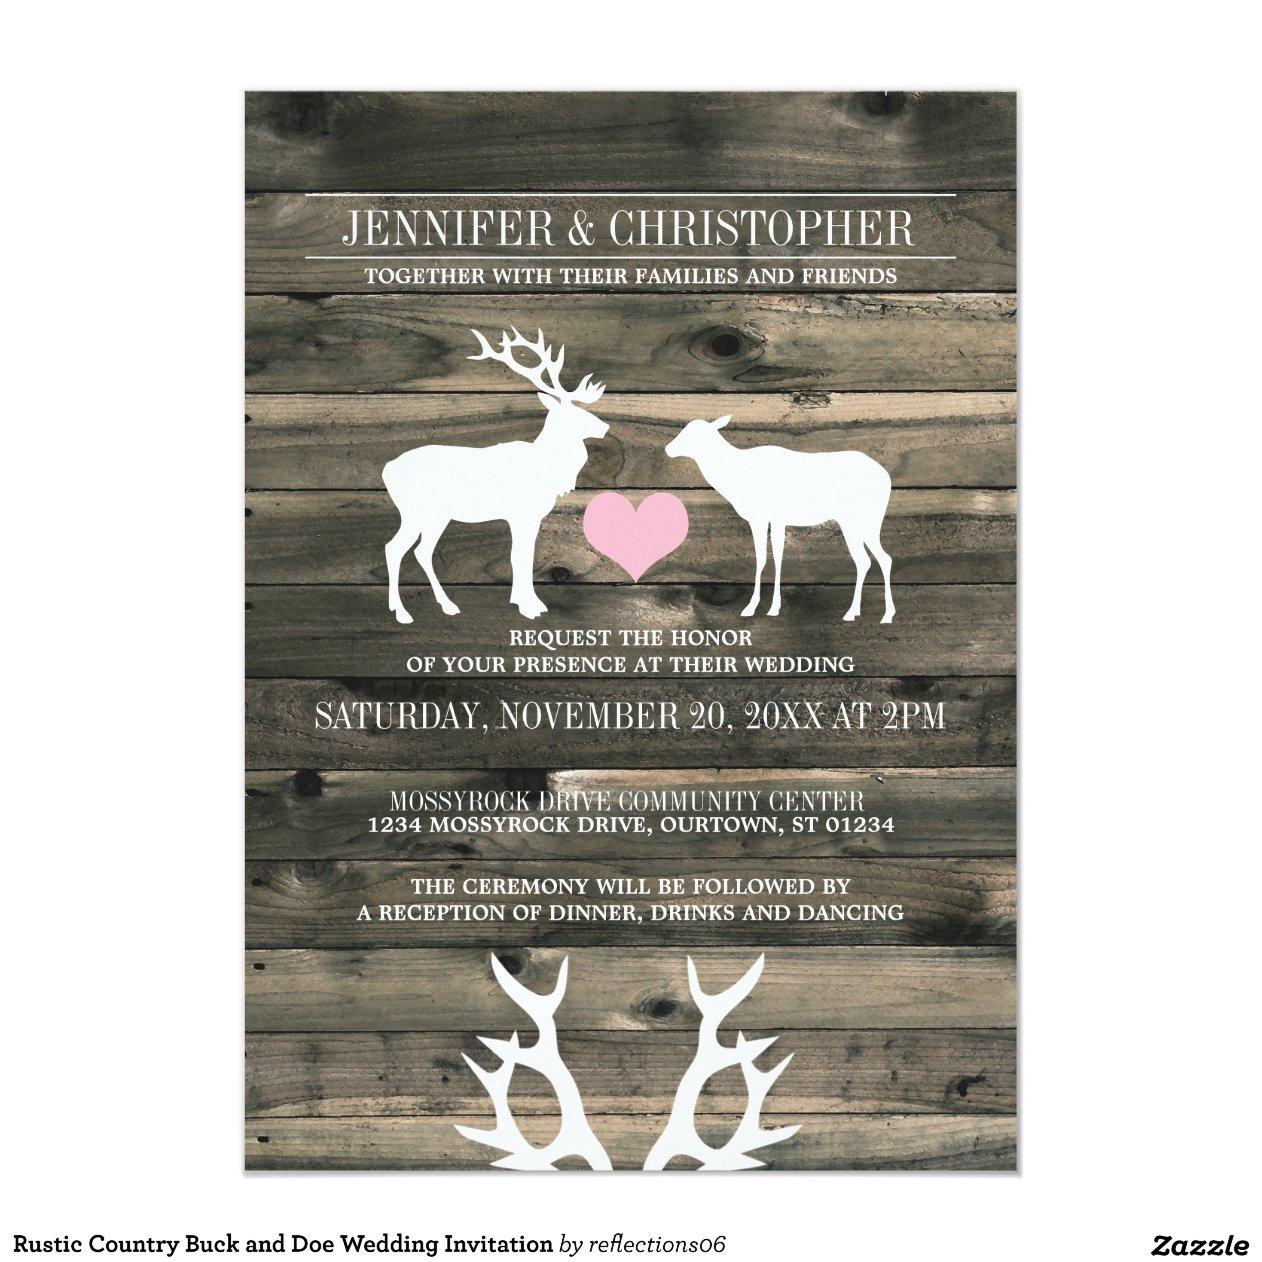 Rustic Country Buck And Doe Wedding Invitation R4c8e527be623448cbc4a1f0b68fc0609 Zkrqs 1200 Jpg